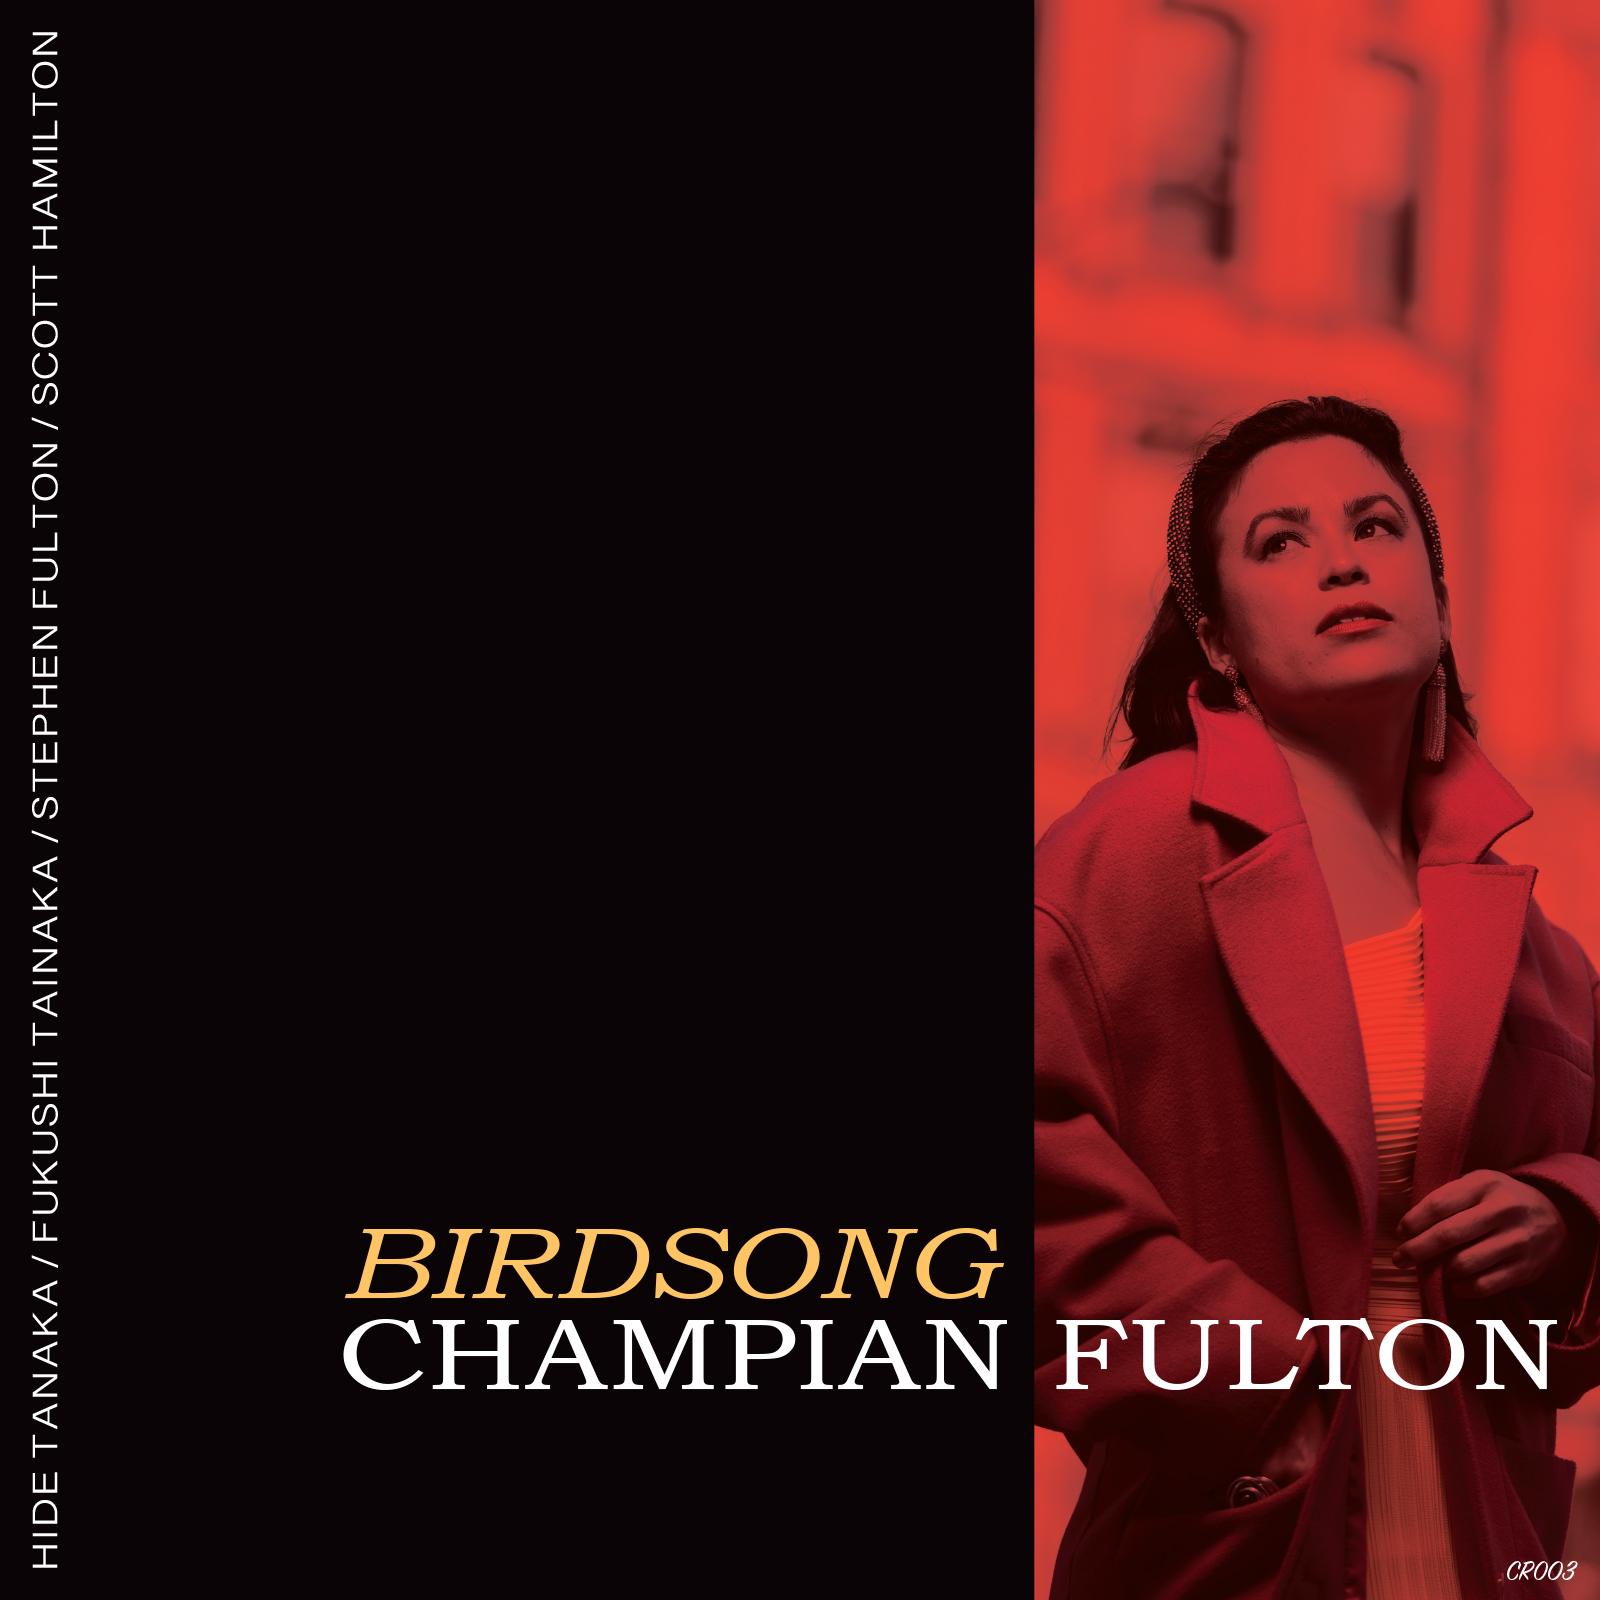 The Jazz Session #536: Champian Fulton